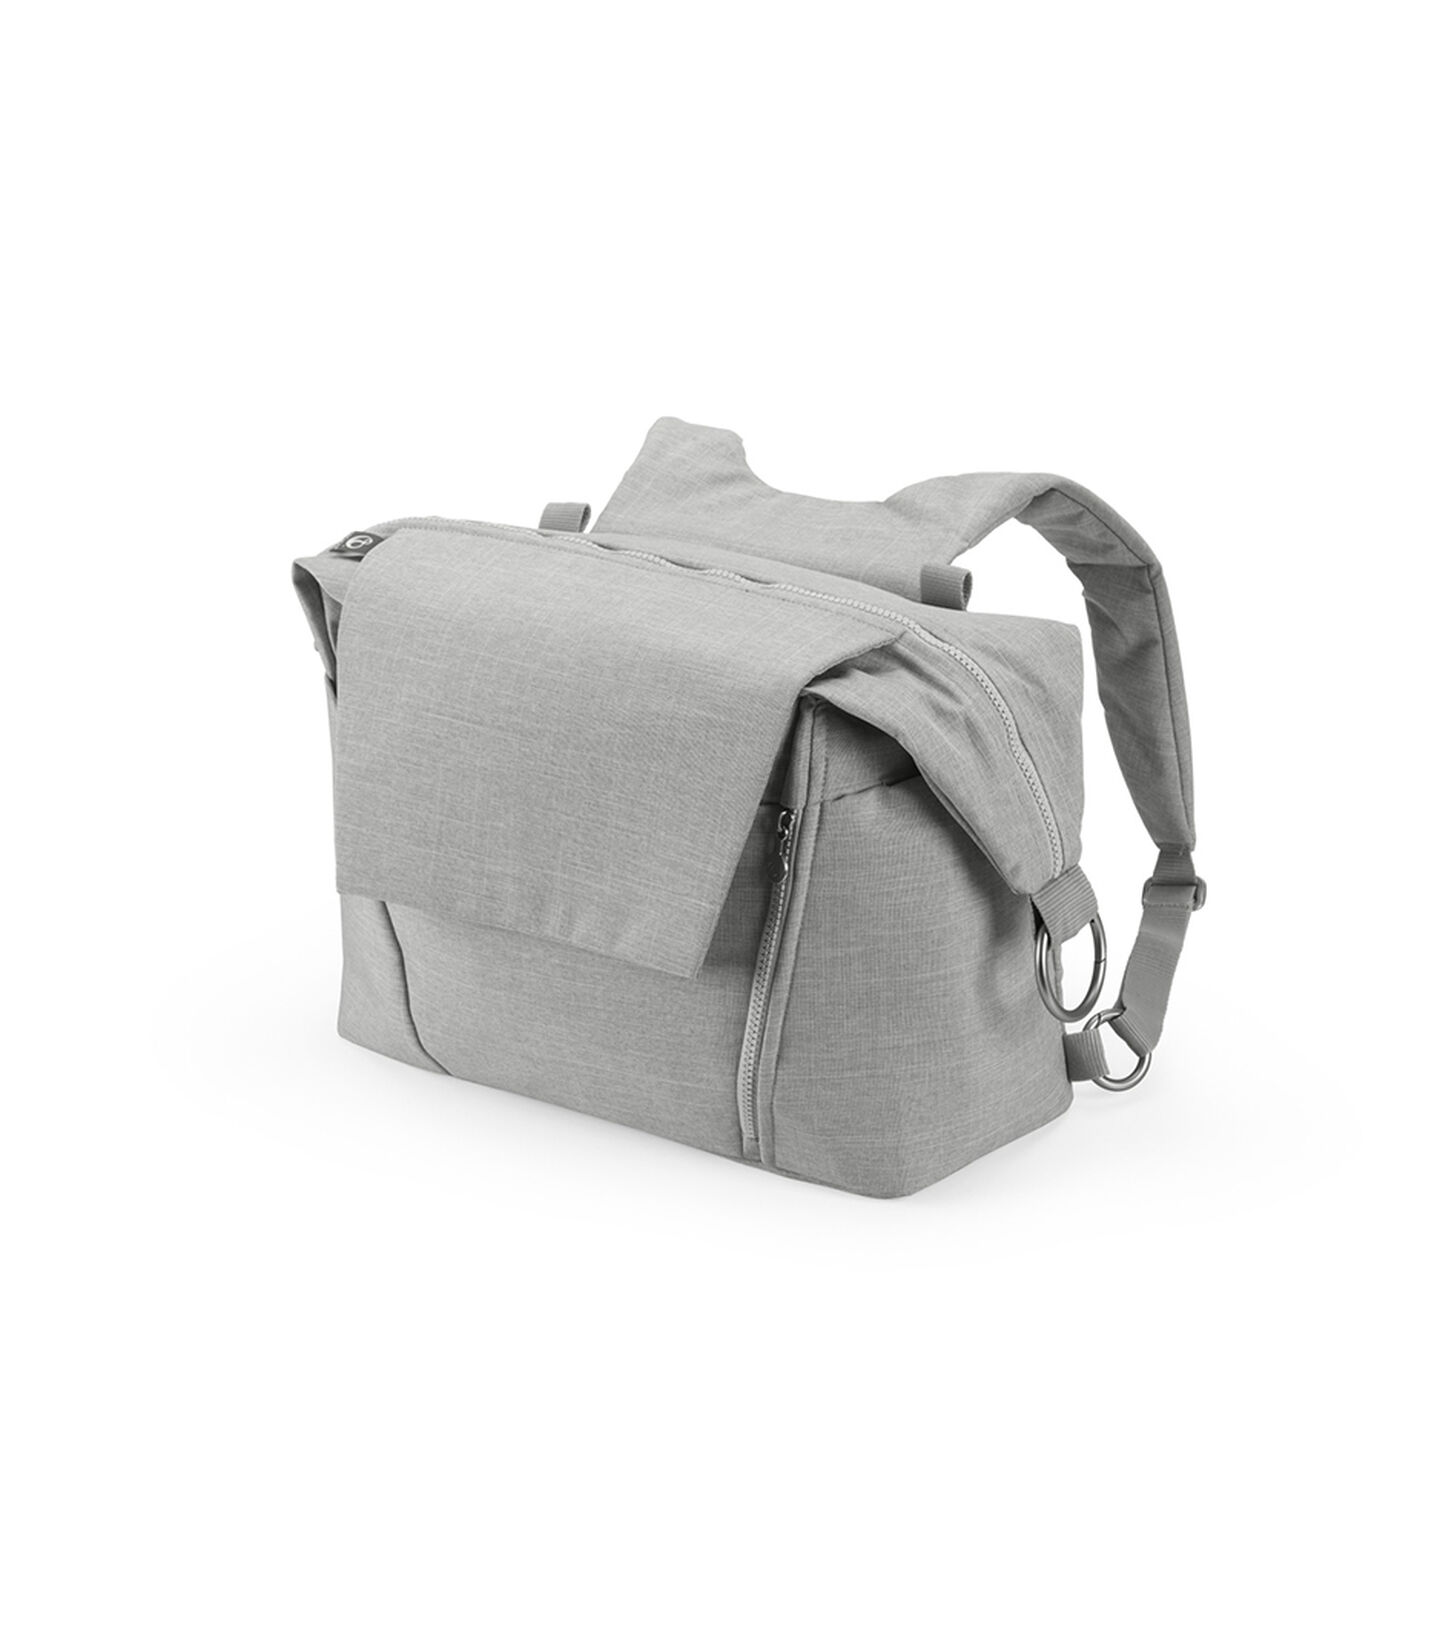 Stokke® Changing Bag Grey Melange, Grey Melange, mainview view 2